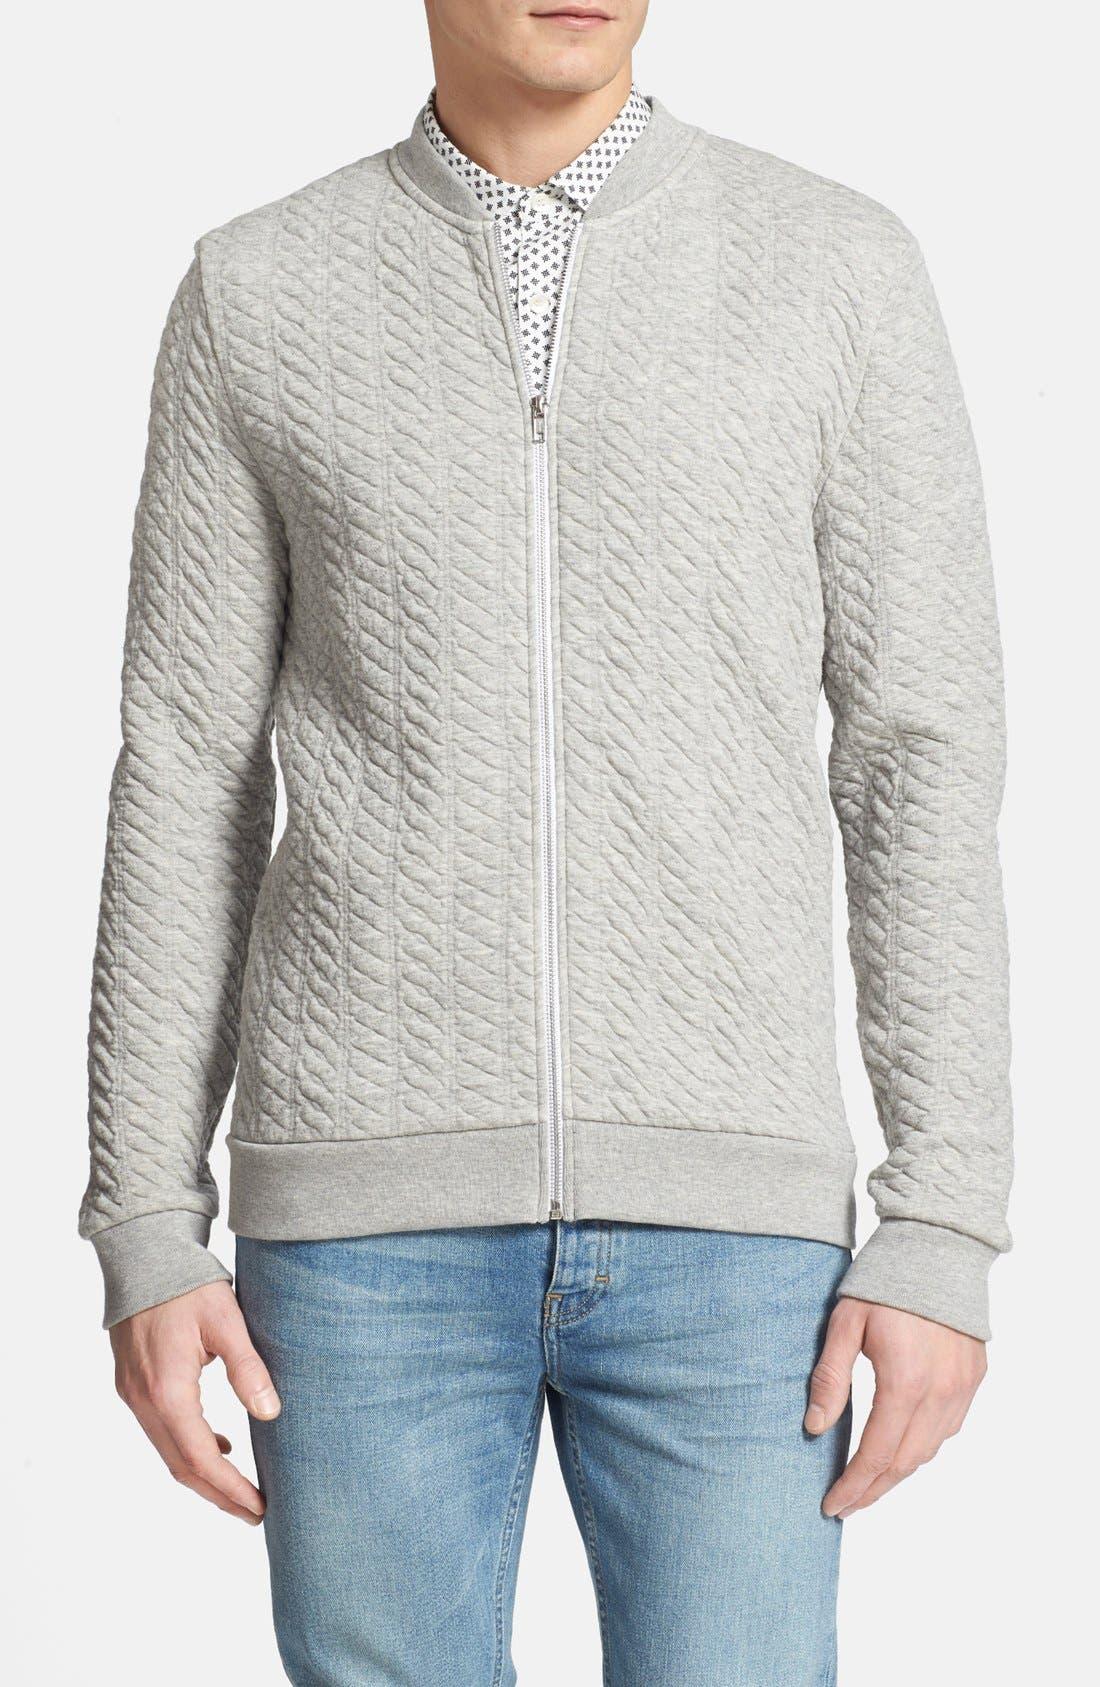 Main Image - Topman Mini Cable Jersey Zip Sweatshirt